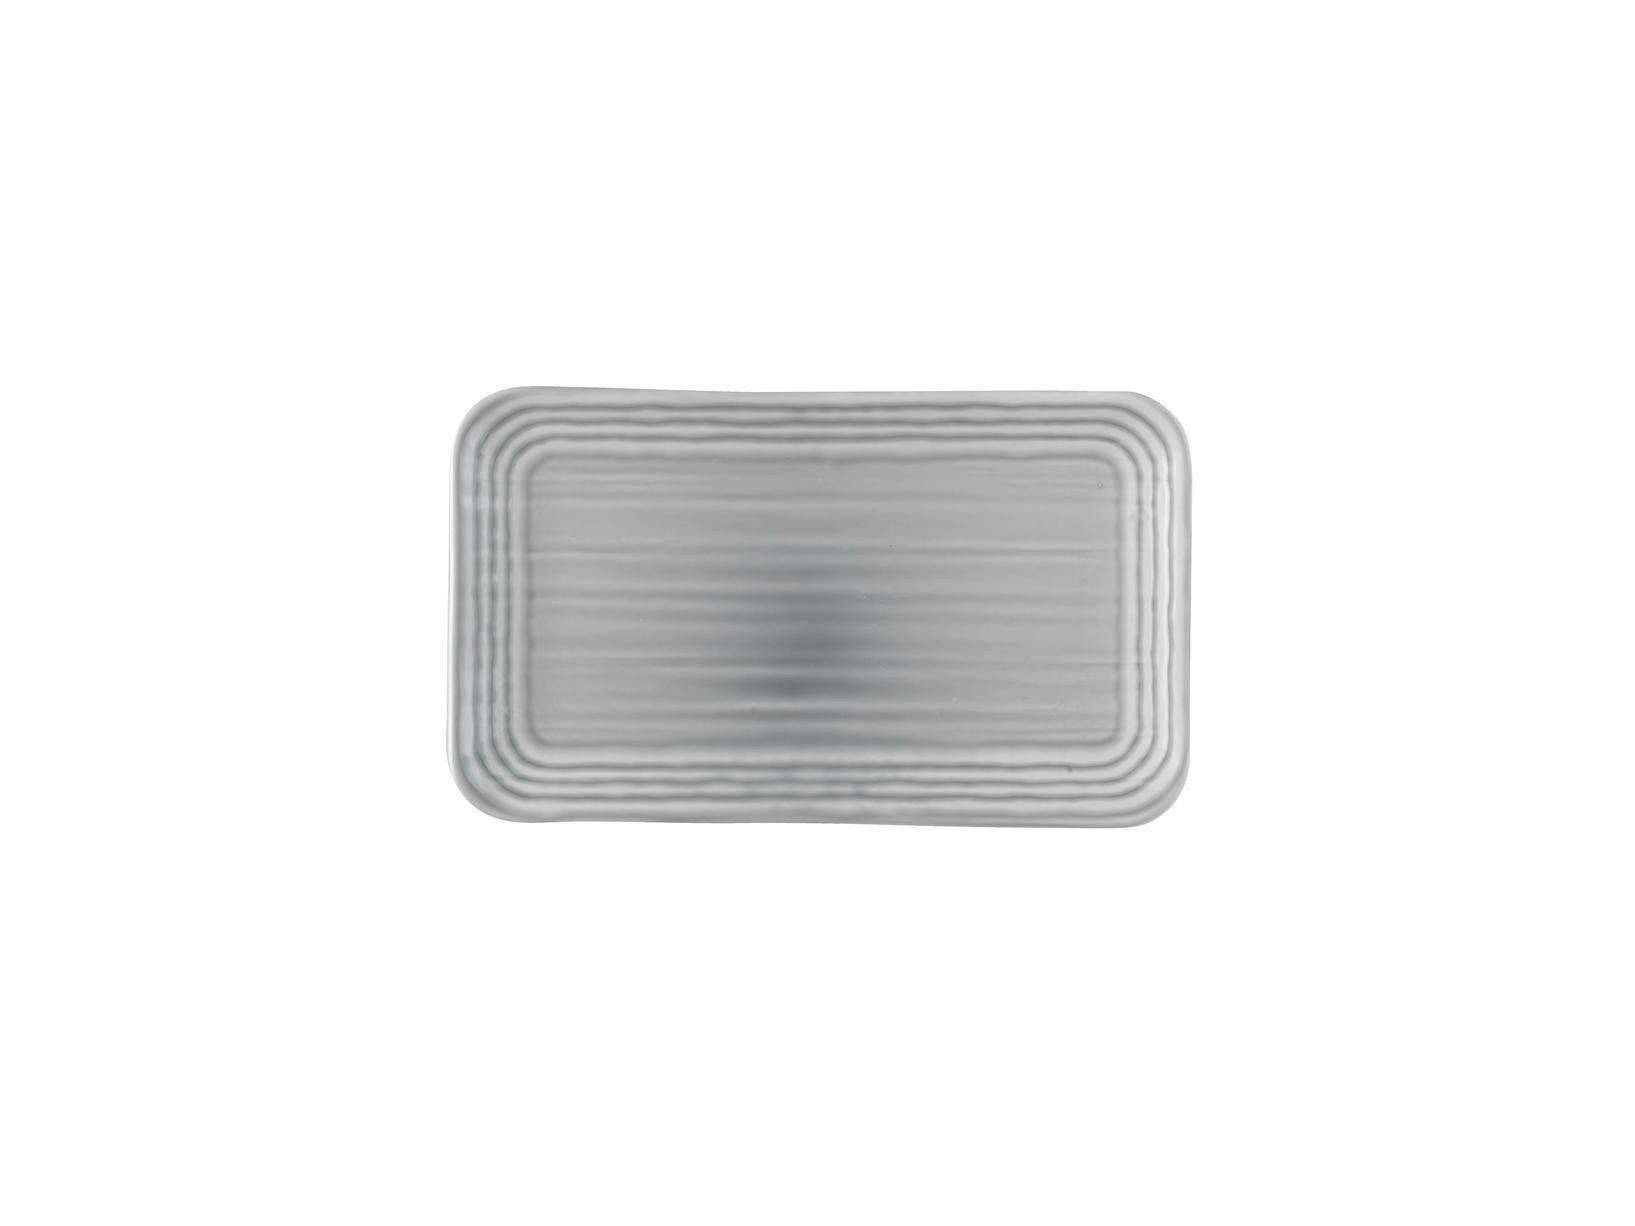 Dudson Harvest Norse Grey organic rectangular plate 27 x 16 cm